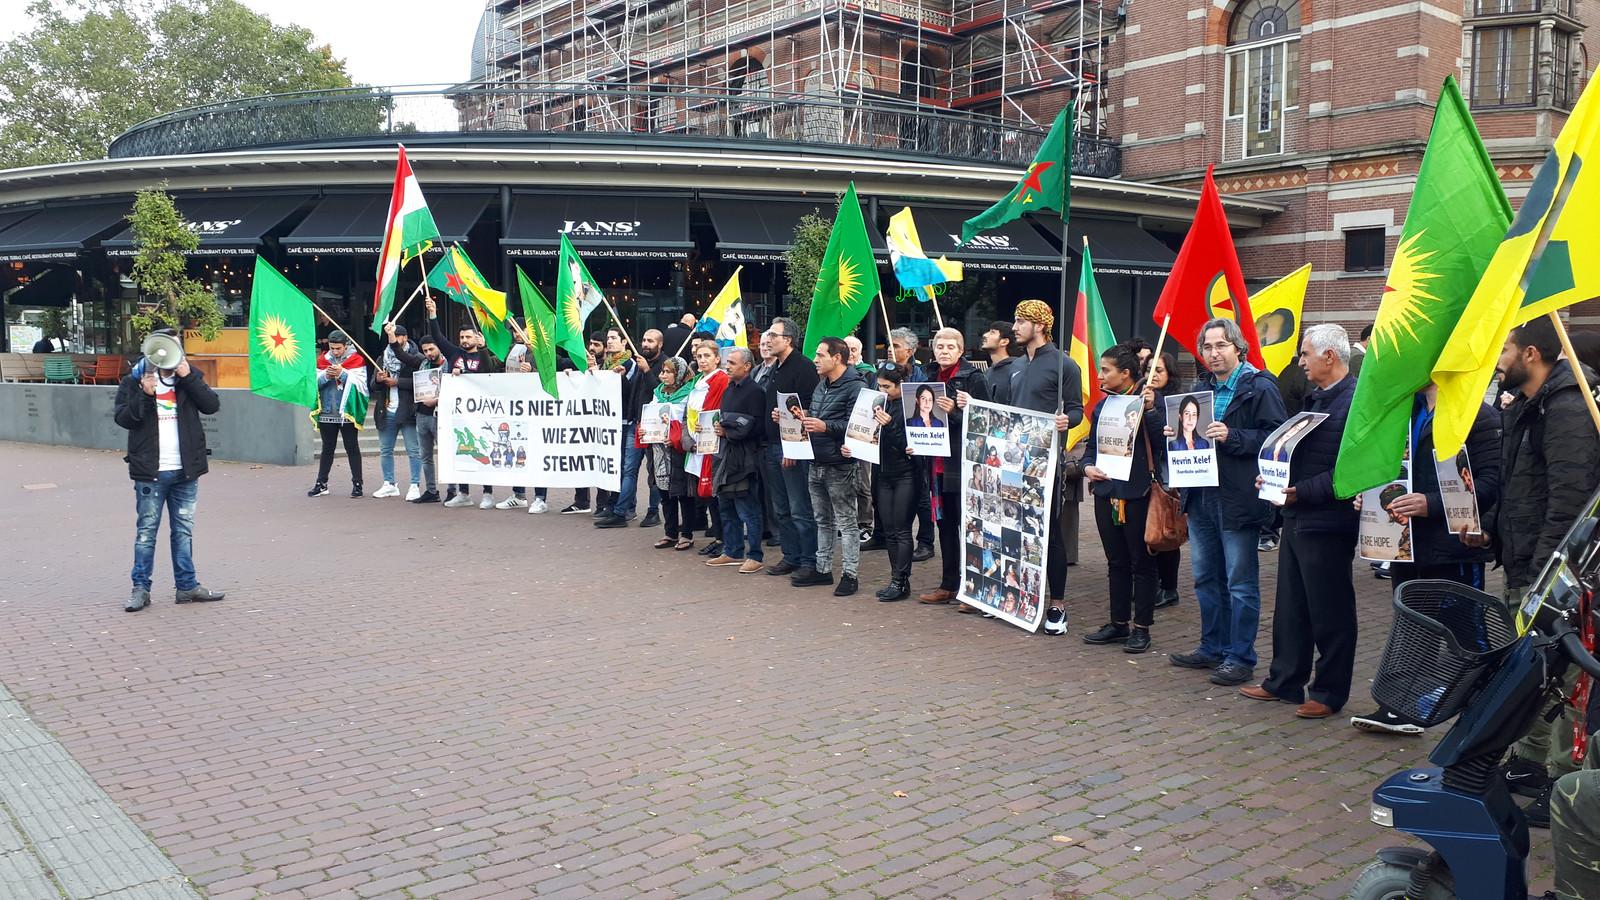 Arnhemse Koerden protesteren in Arnhem